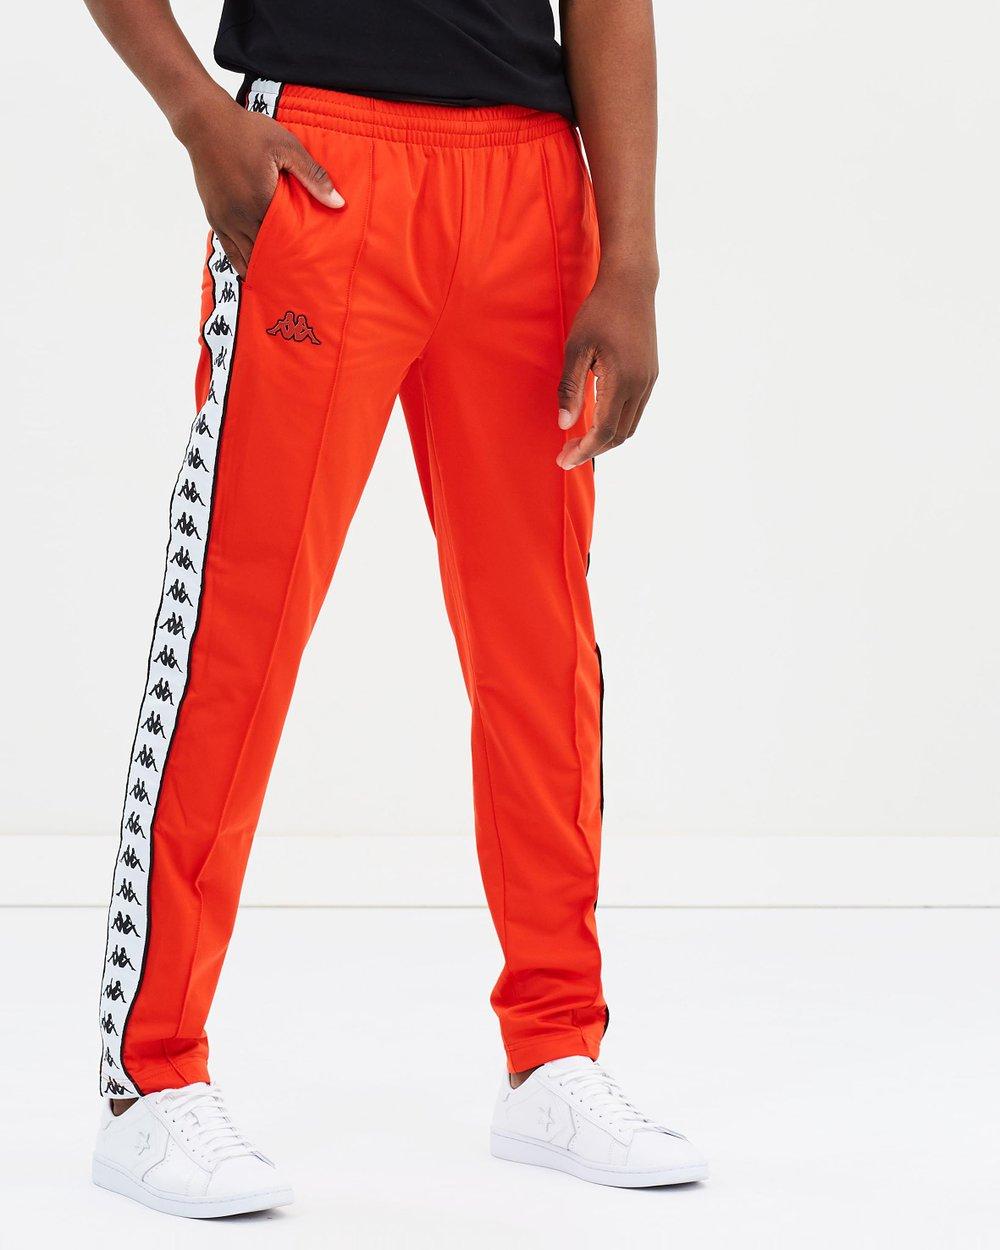 bfeb9c2d1d18 Banda Astoria Slim Pants by Kappa Online